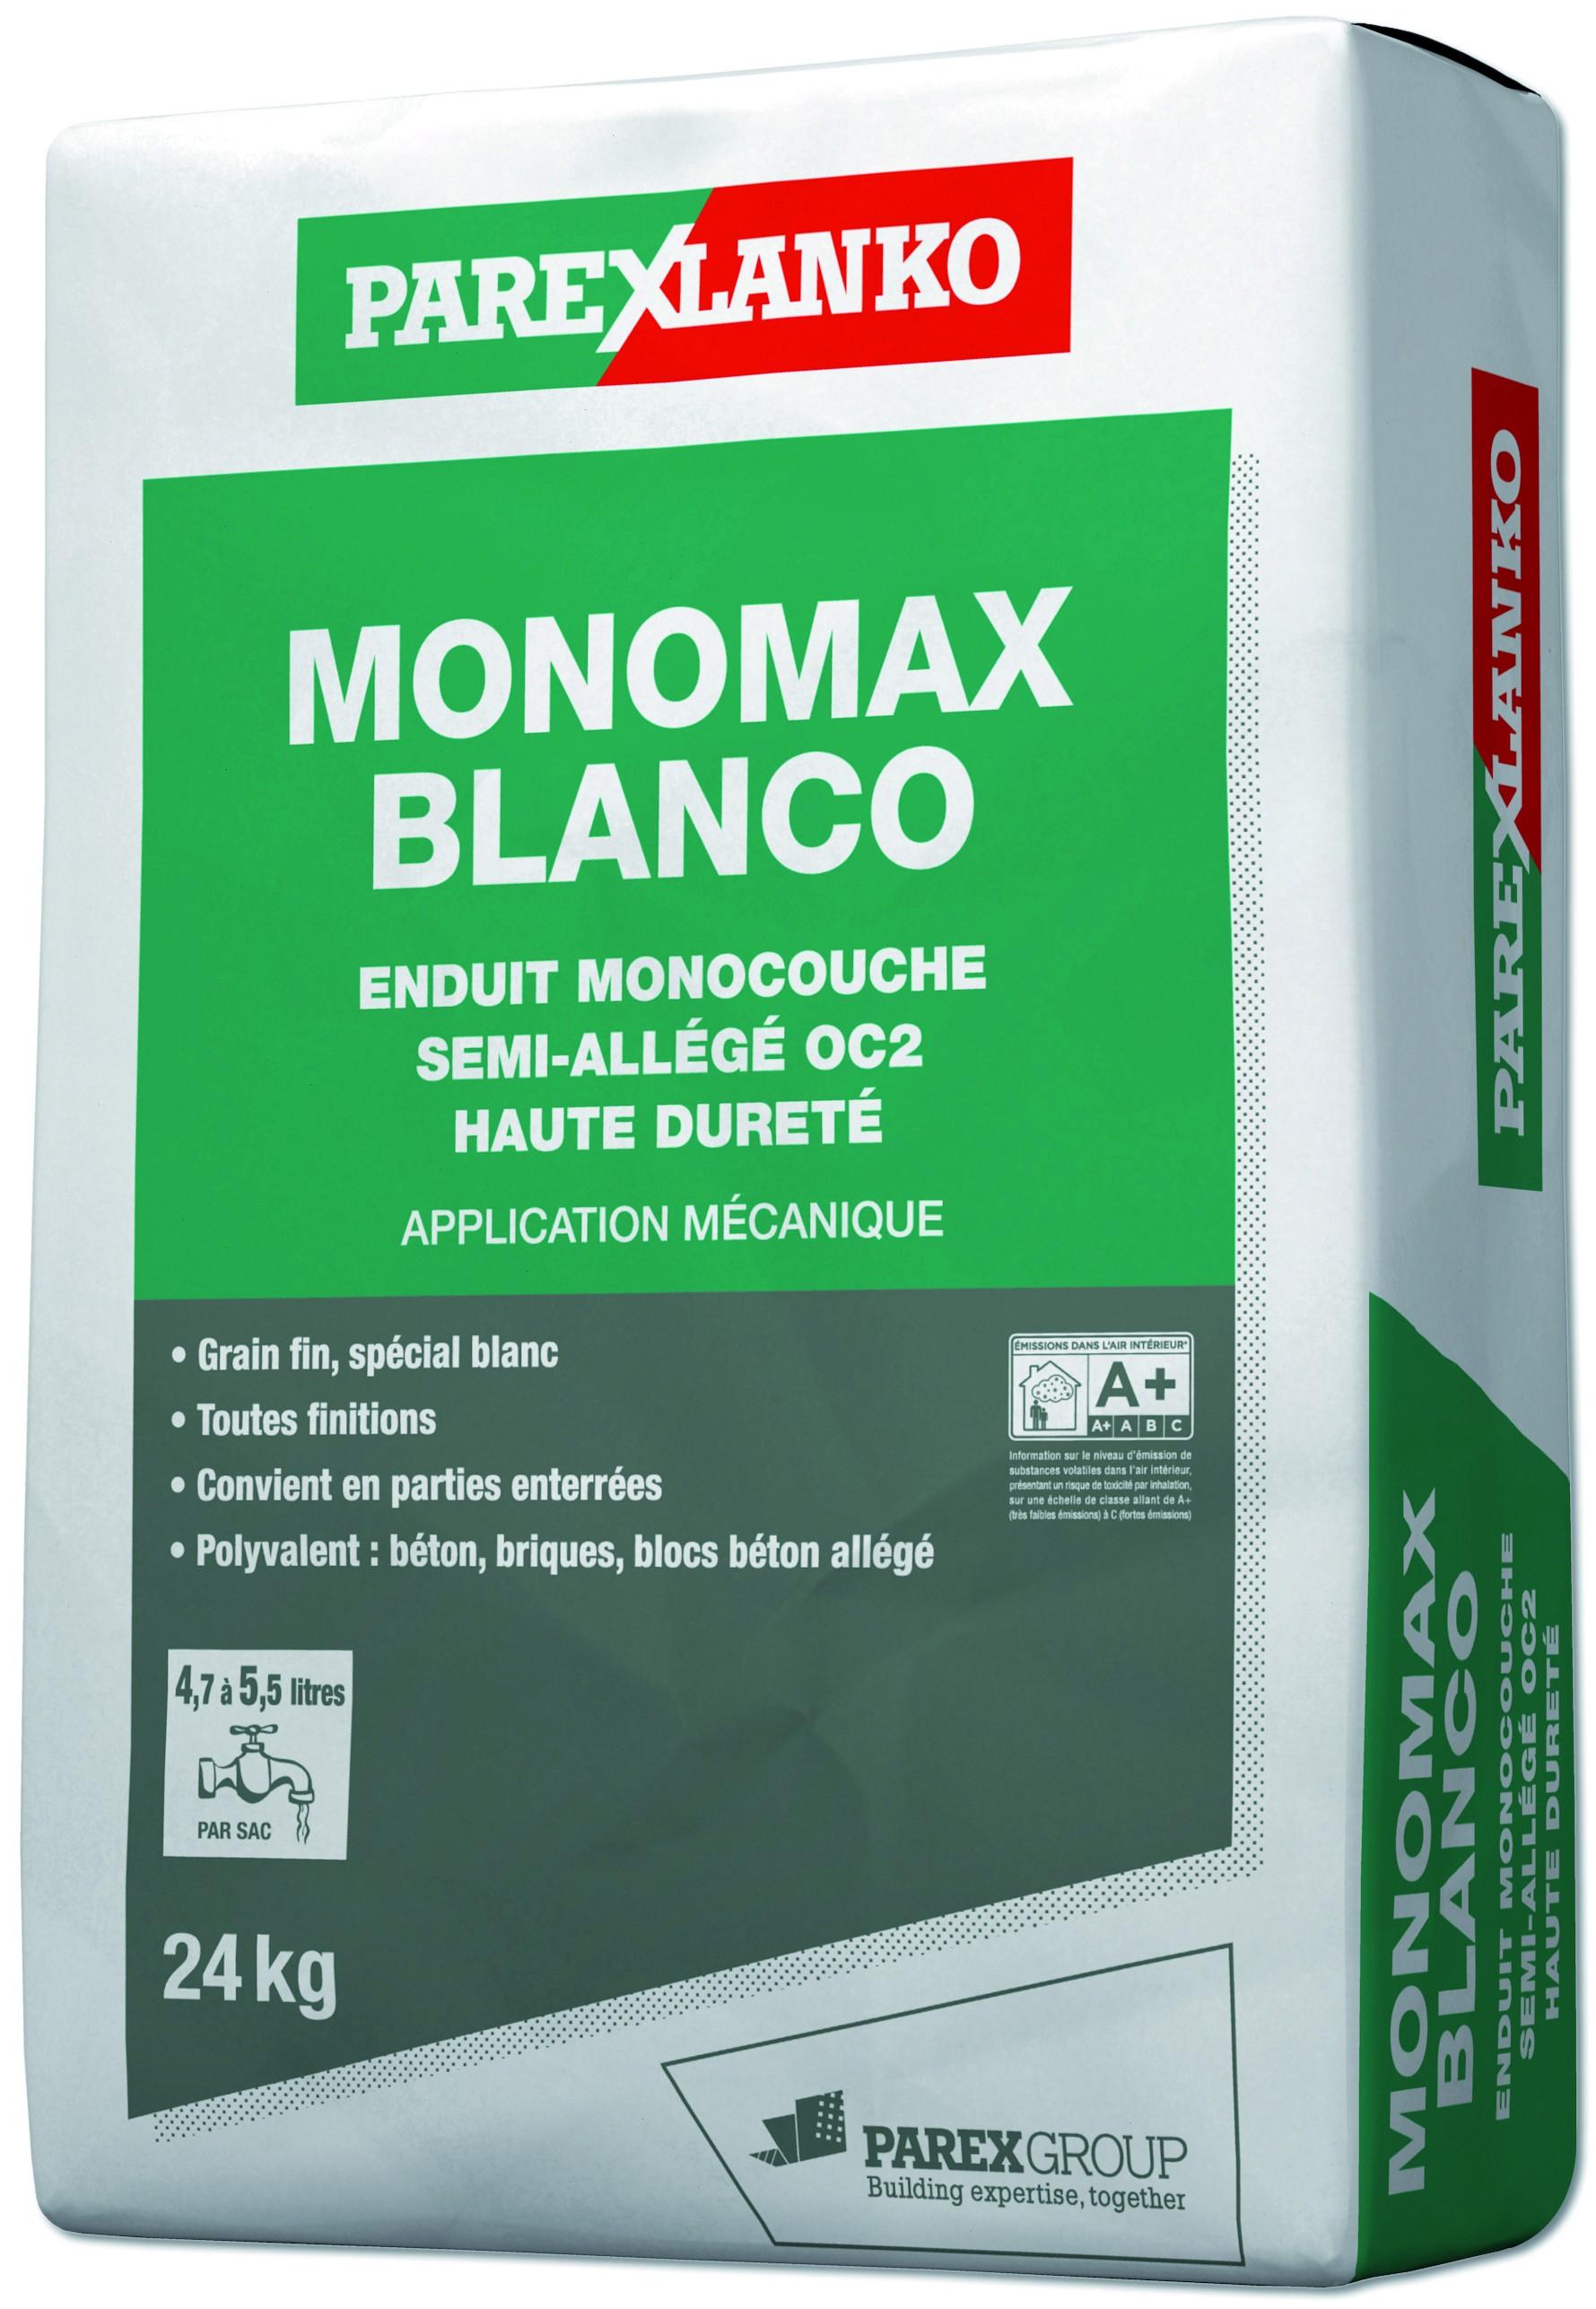 Enduit monocouche semi-allégé grain fin spécial blanc Monomax Blanco Parexlanko